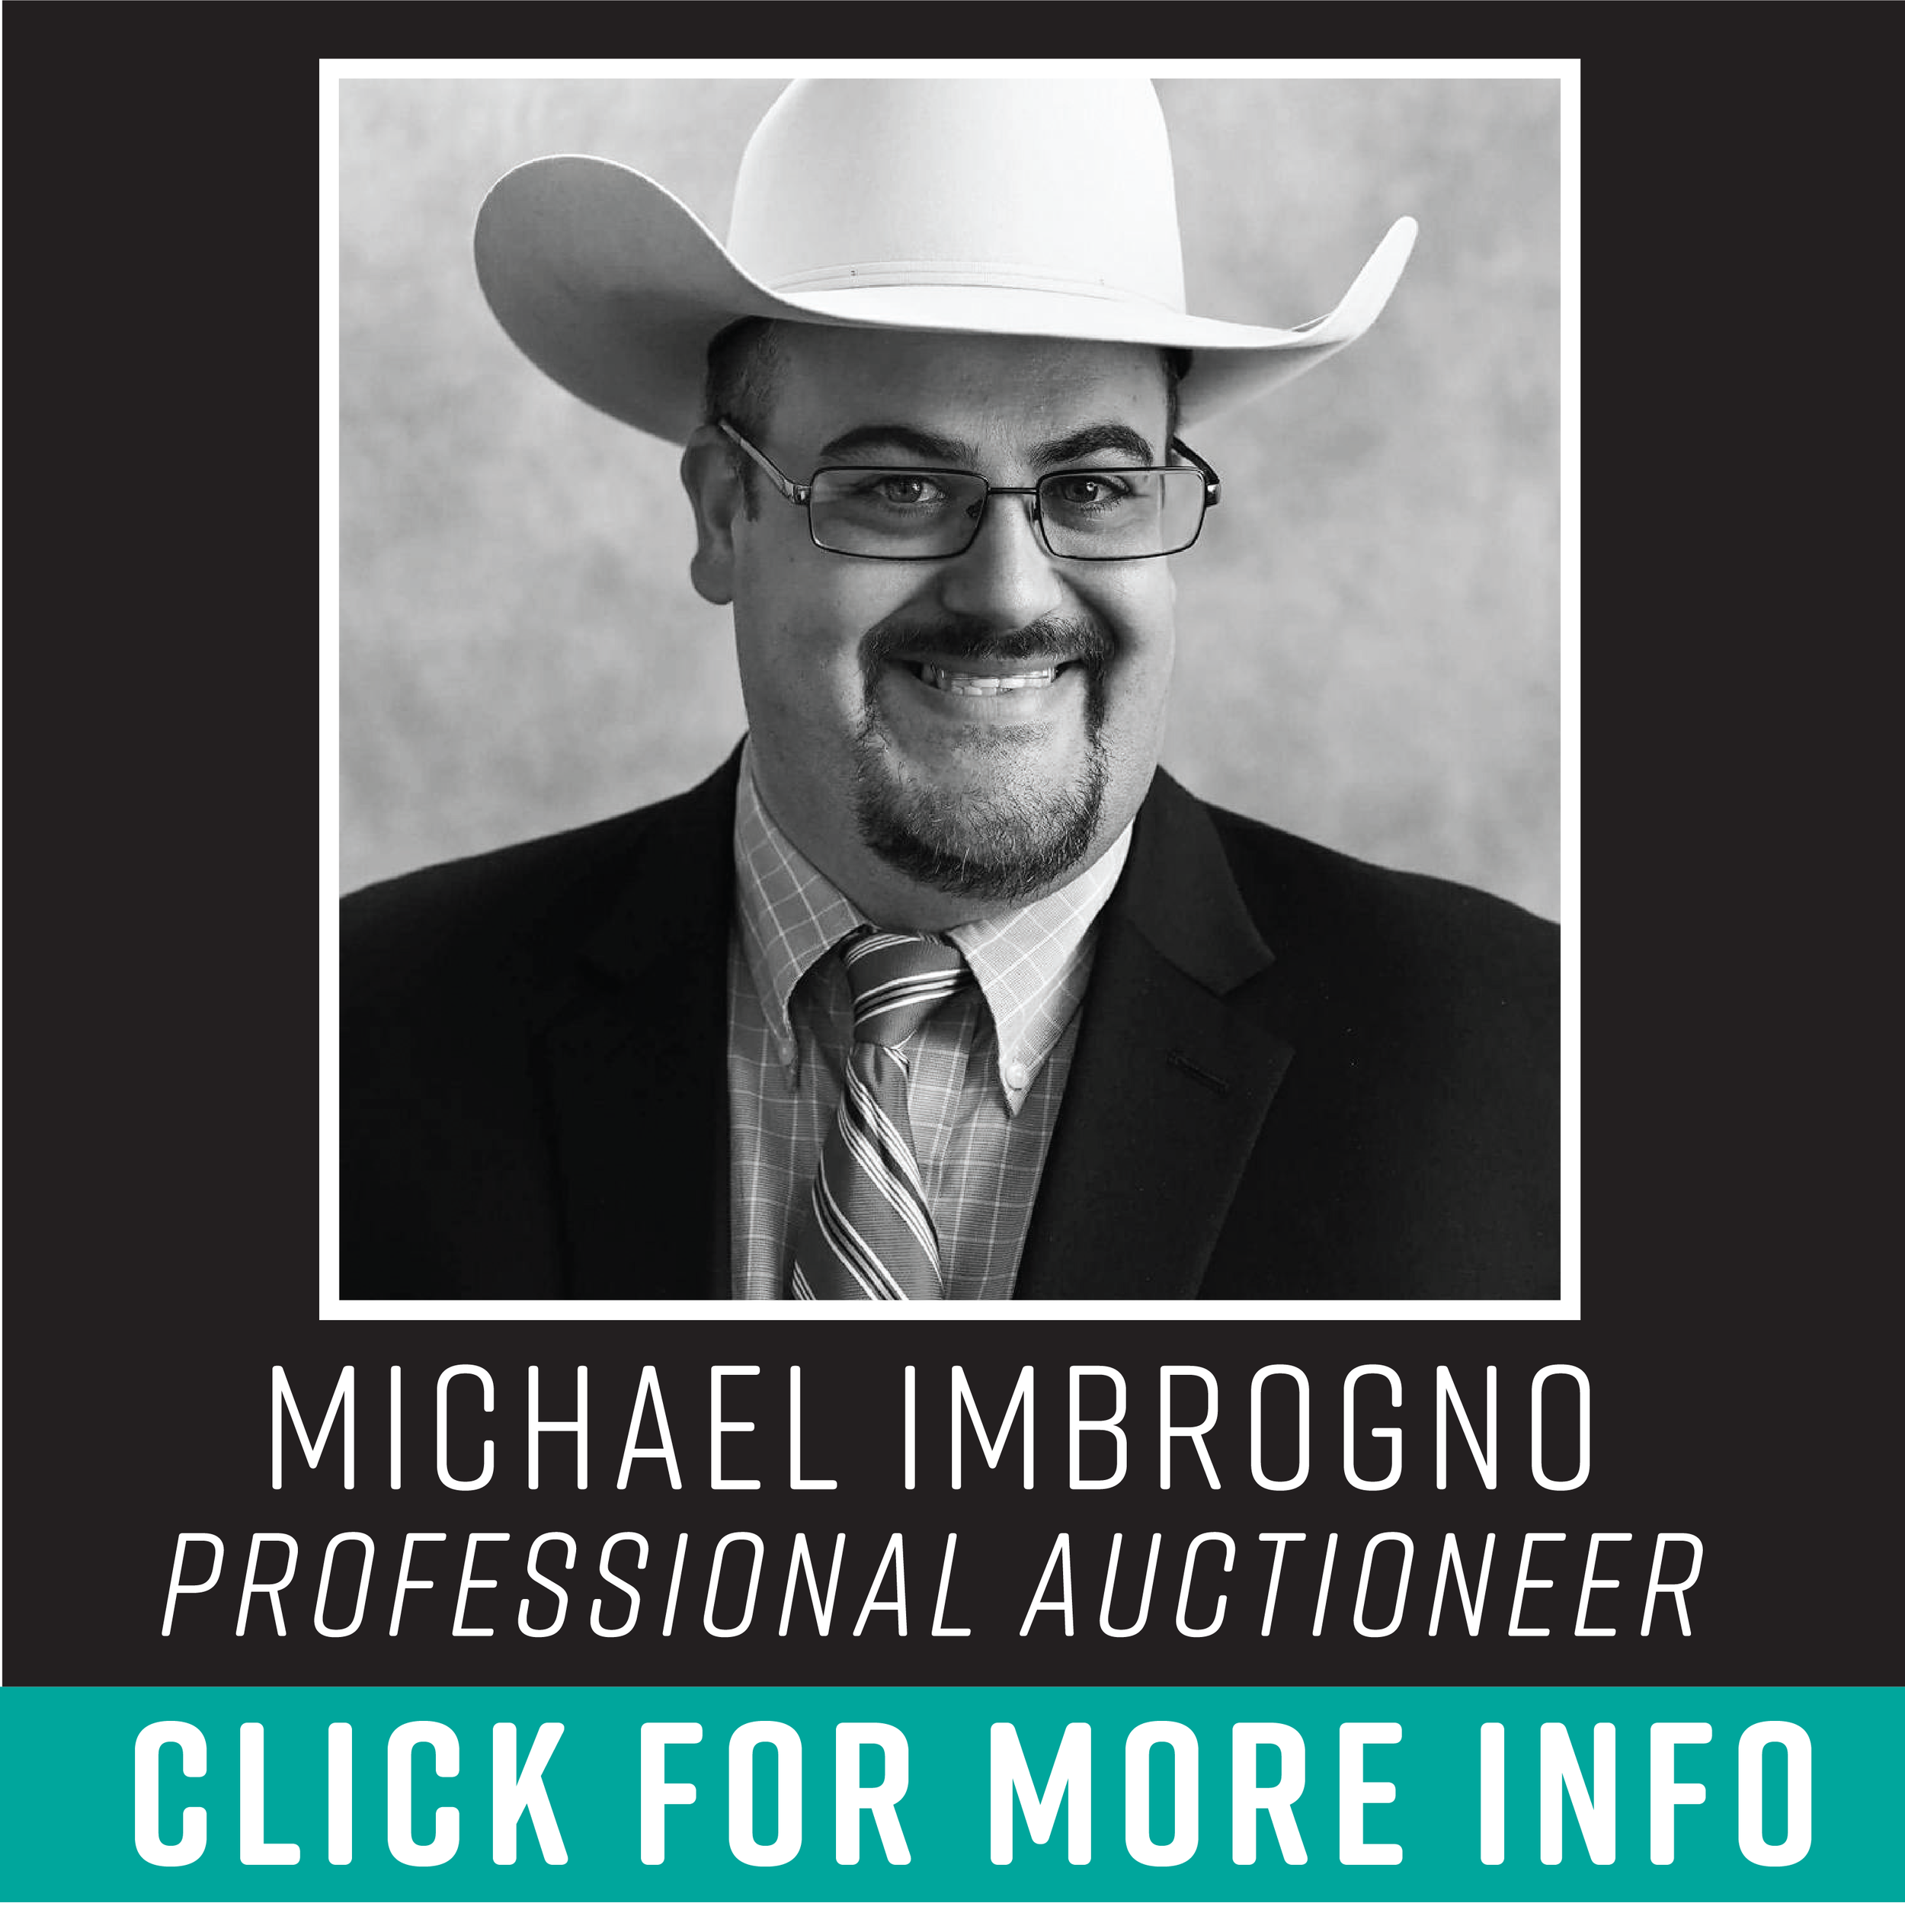 Michael Imbrogno: 290-678-5179